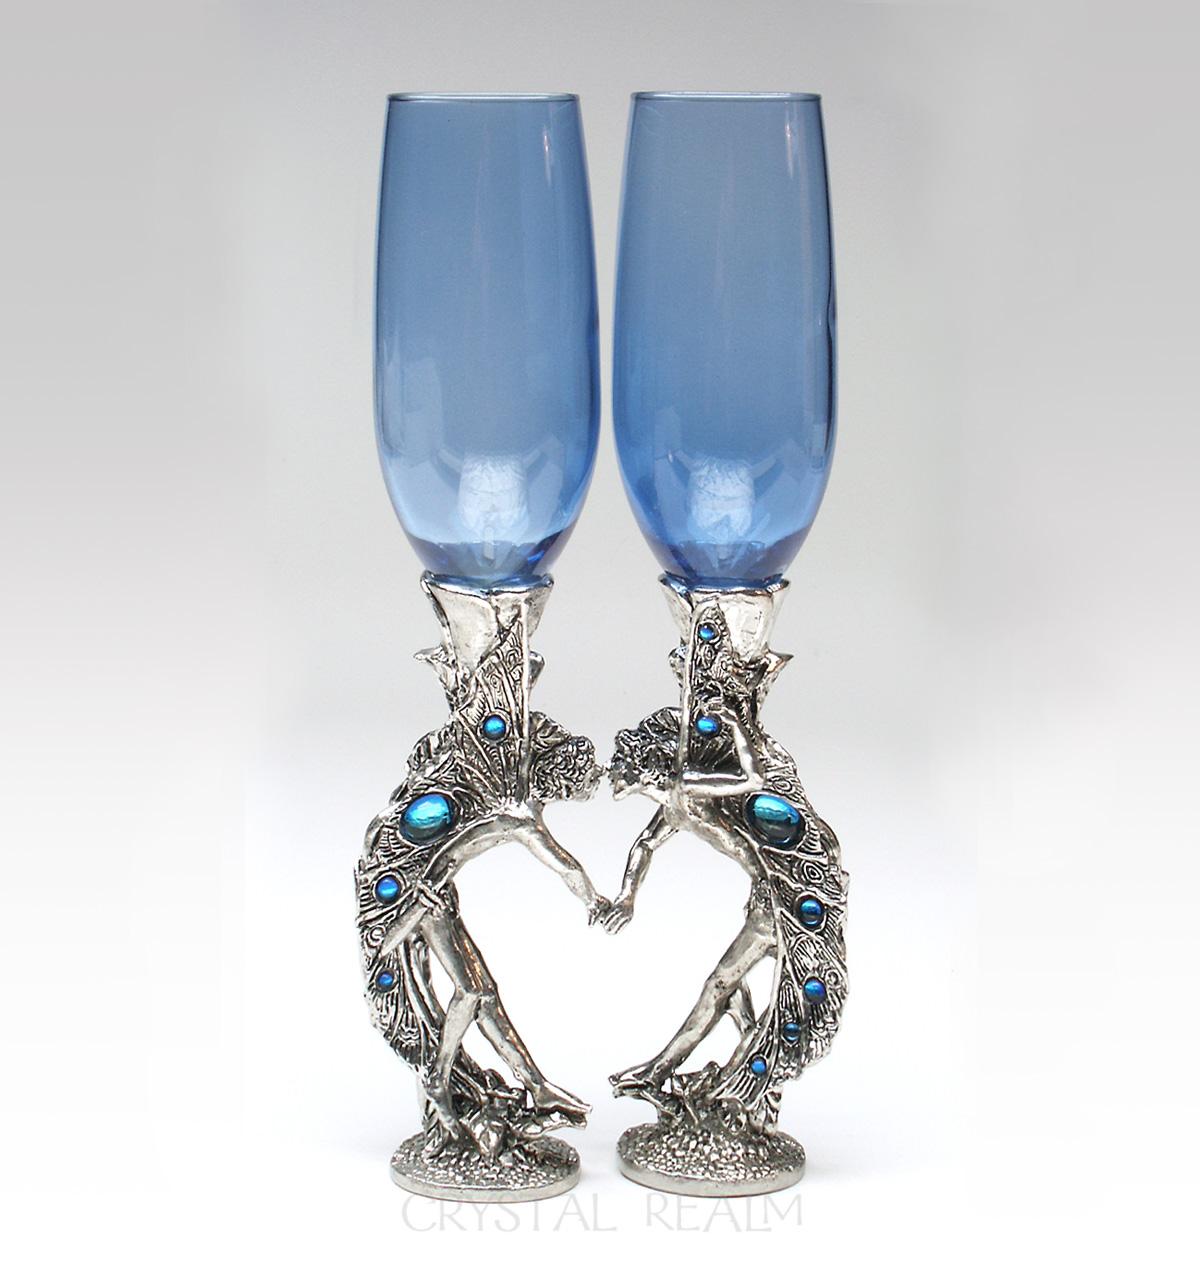 Boy-boy fairy heart toasting glasses in blue